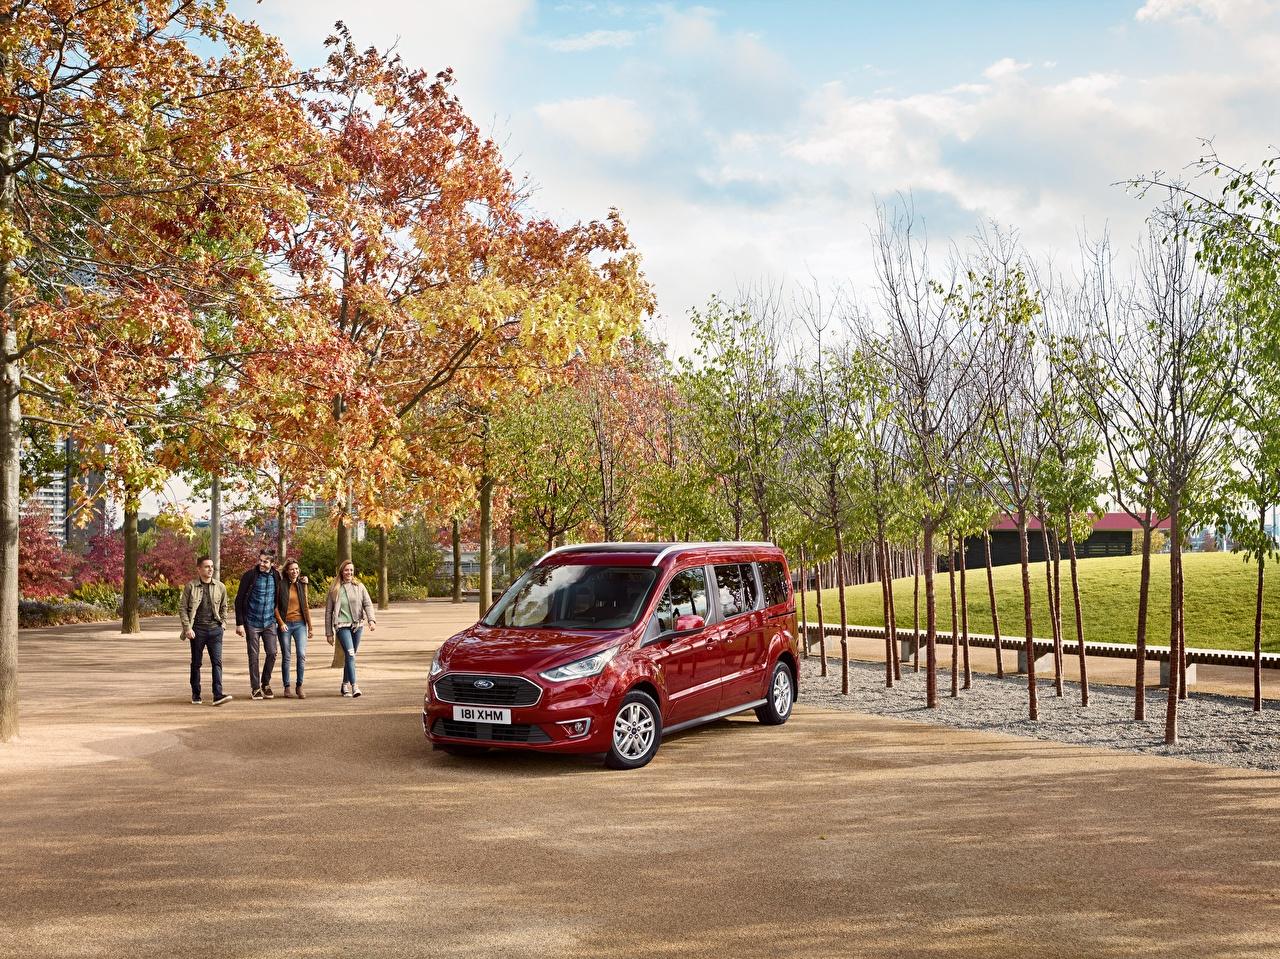 Картинки Форд 2018 Grand Tourneo Connect Worldwide темно красный машина Металлик Ford Бордовый бордовые бордовая авто машины автомобиль Автомобили